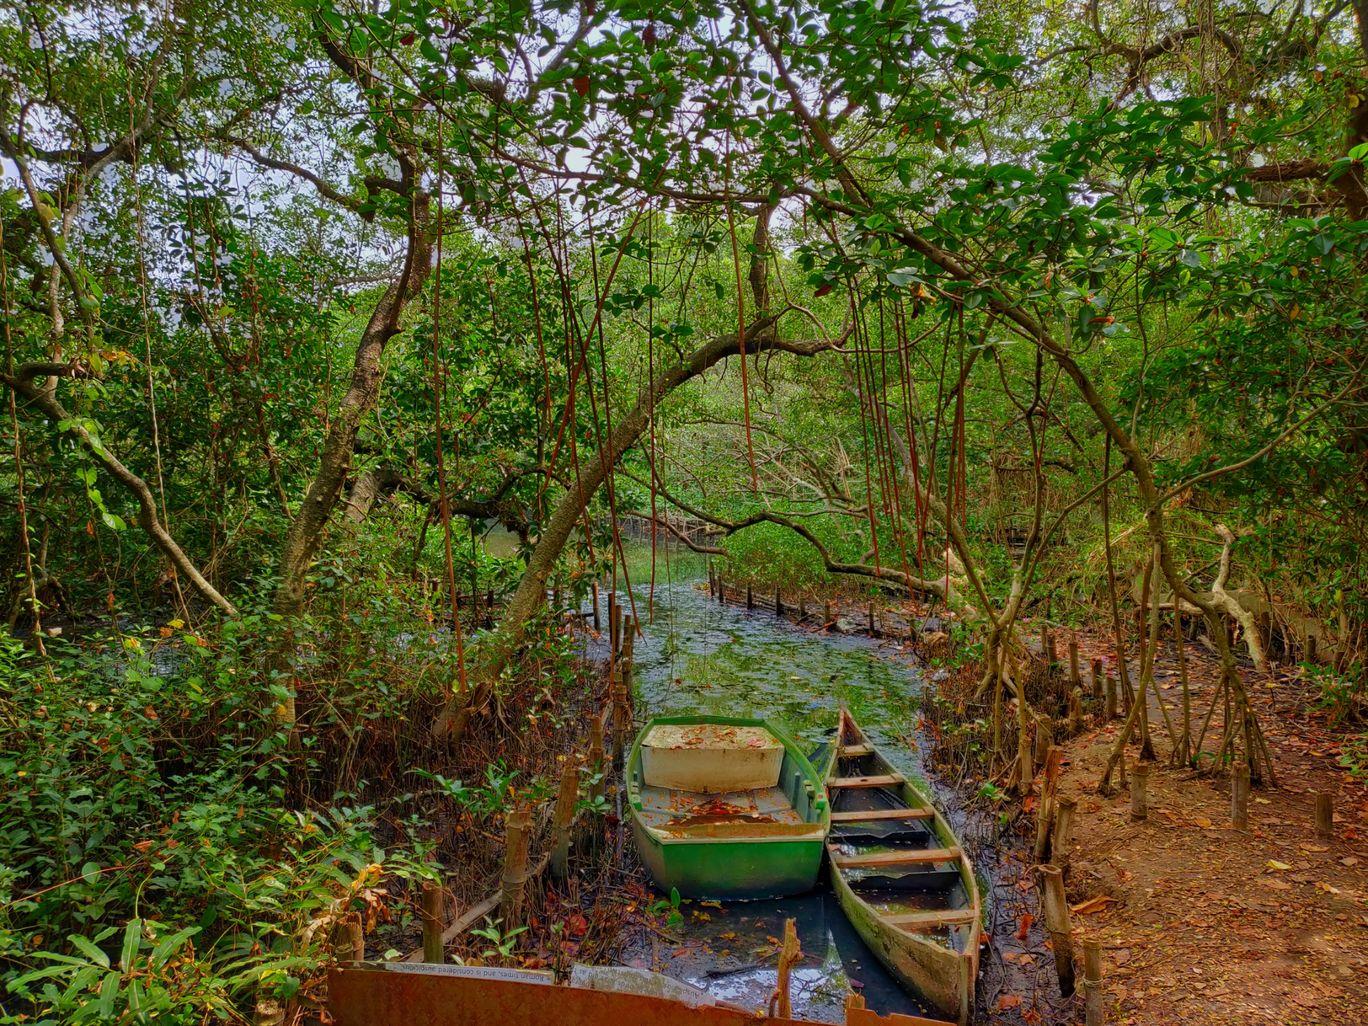 Photo of Kochi By Vinay Datta